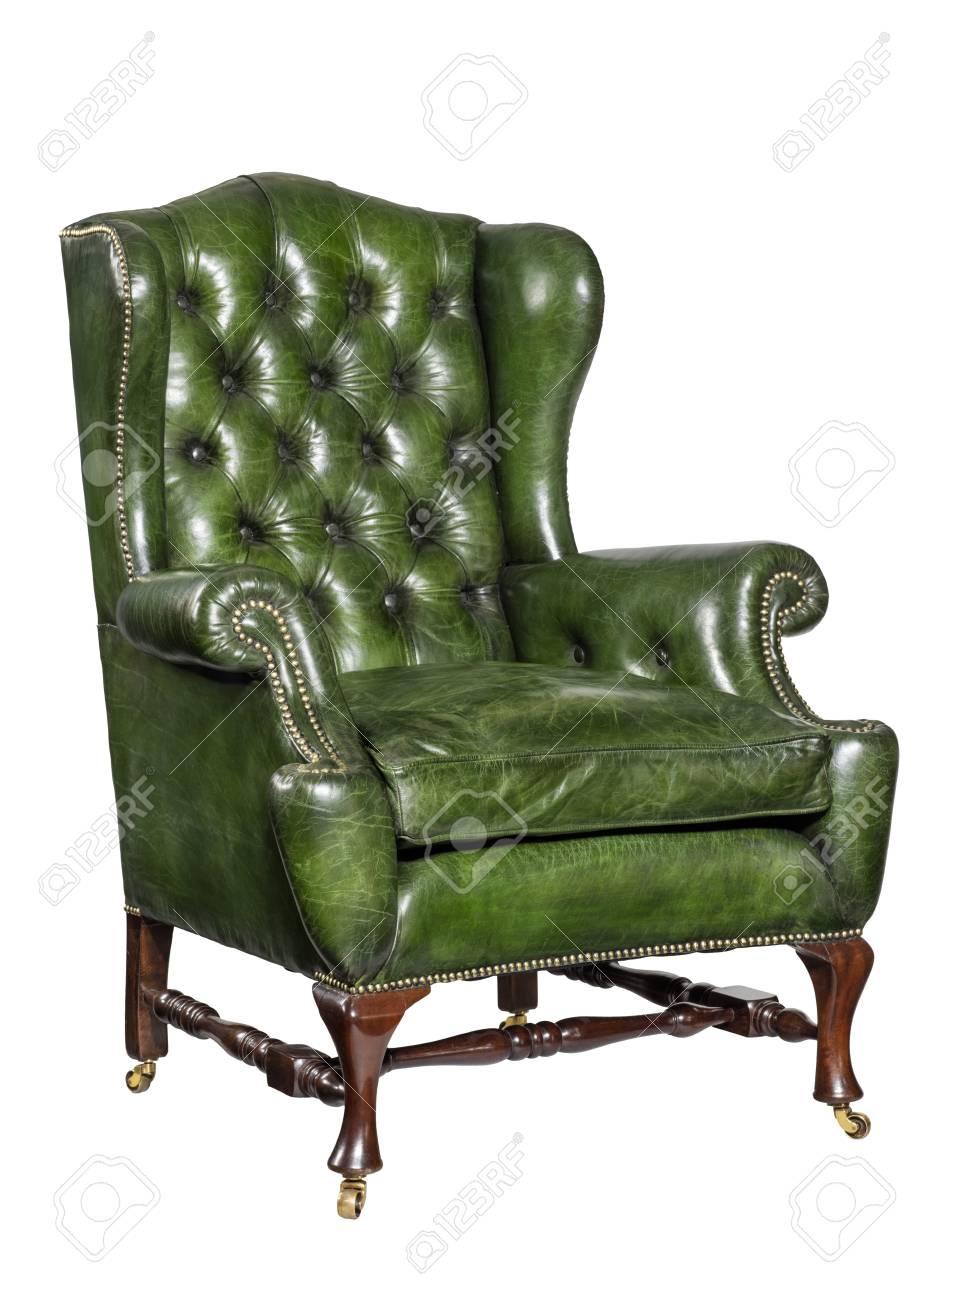 Poltrona Pelle Verde.Vecchia Comoda Poltrona Antica In Pelle Verde Con Braccio Da Ala 18 19 Secolo